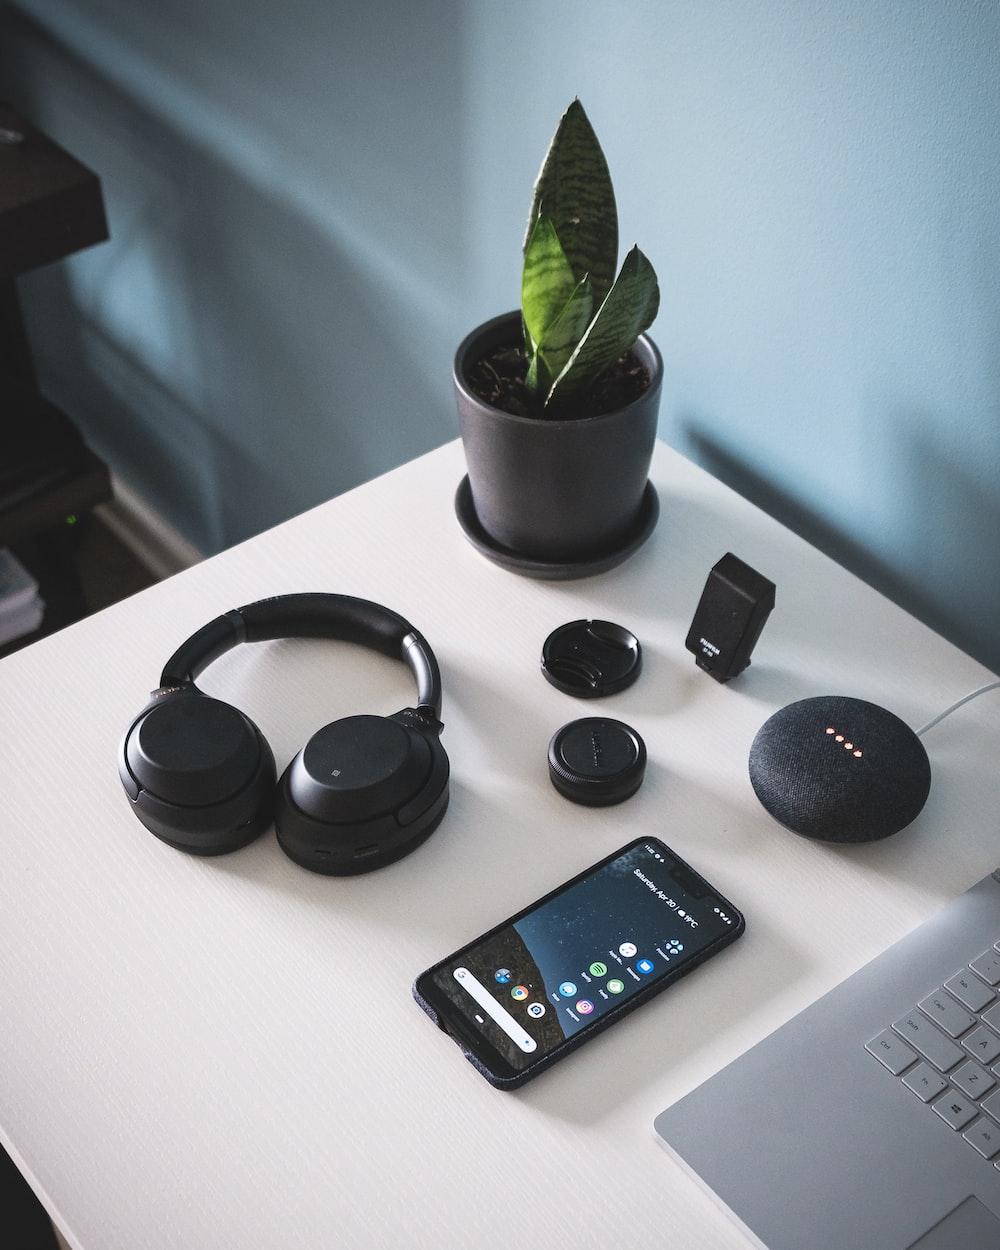 smartphone beside headphones and Google Home Mini